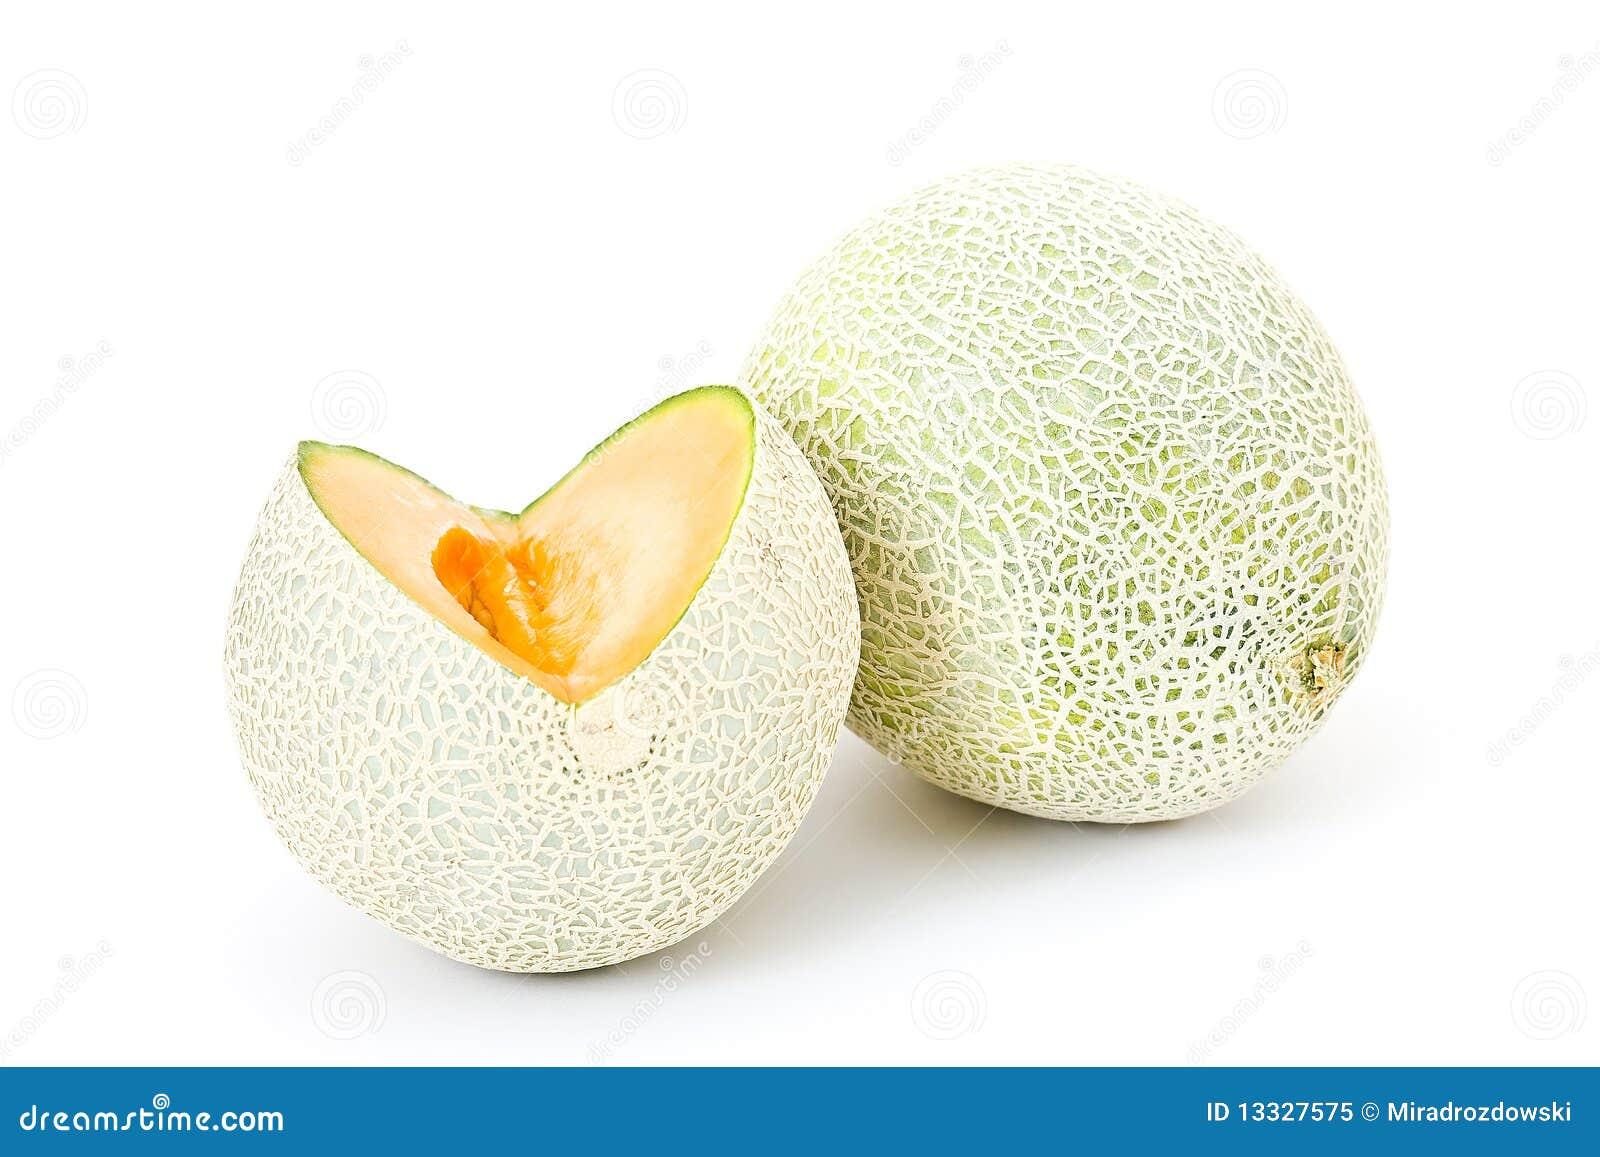 Cantaloupemelonorange